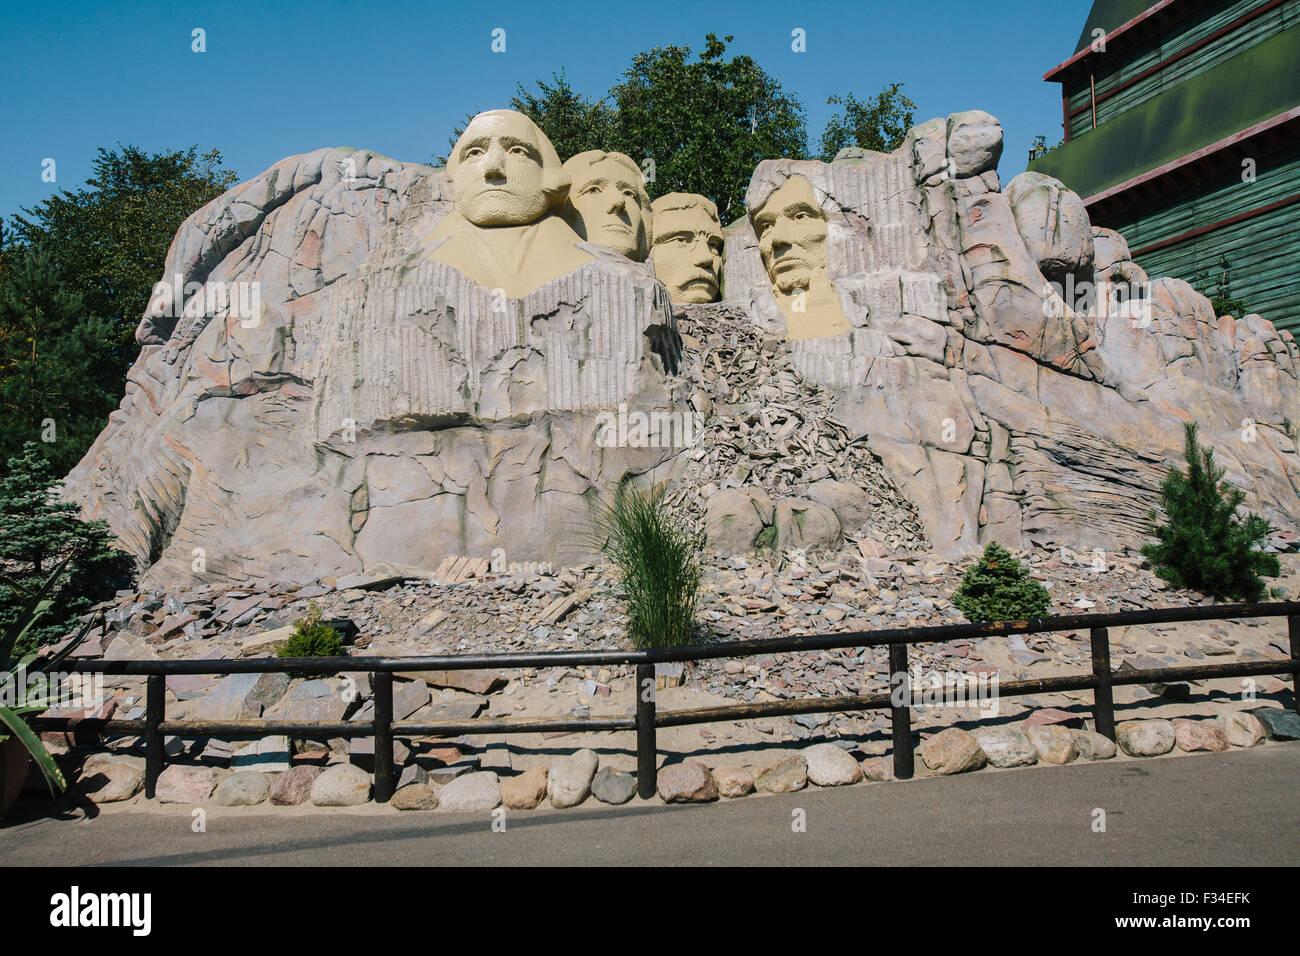 Mount Rushmore National Memorial, Legoland Billund, en modèle. Danemark Photo Stock